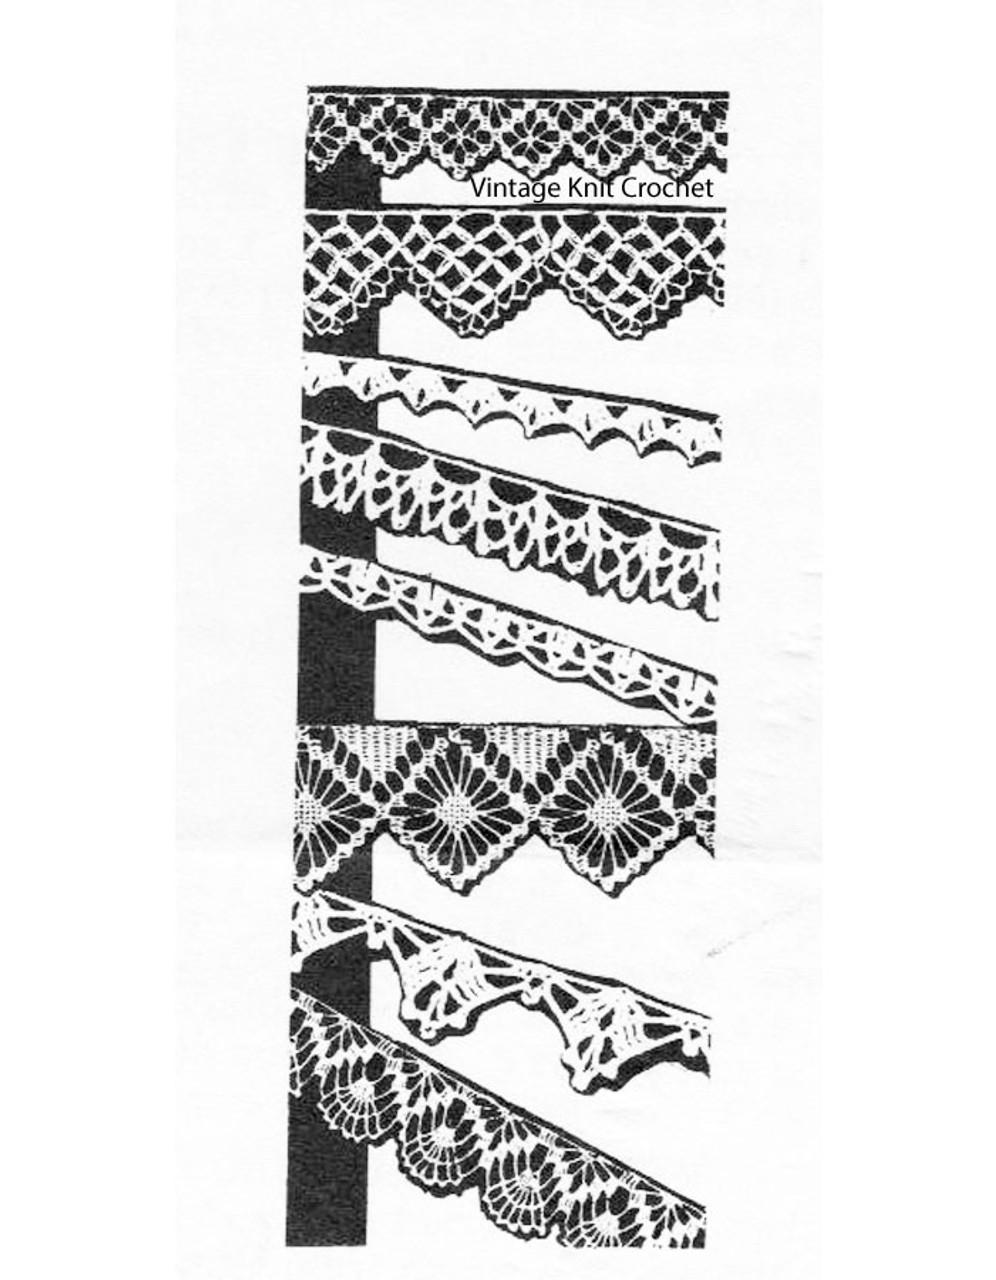 Eight crochet edgings pattern, Alice Brooks 7469